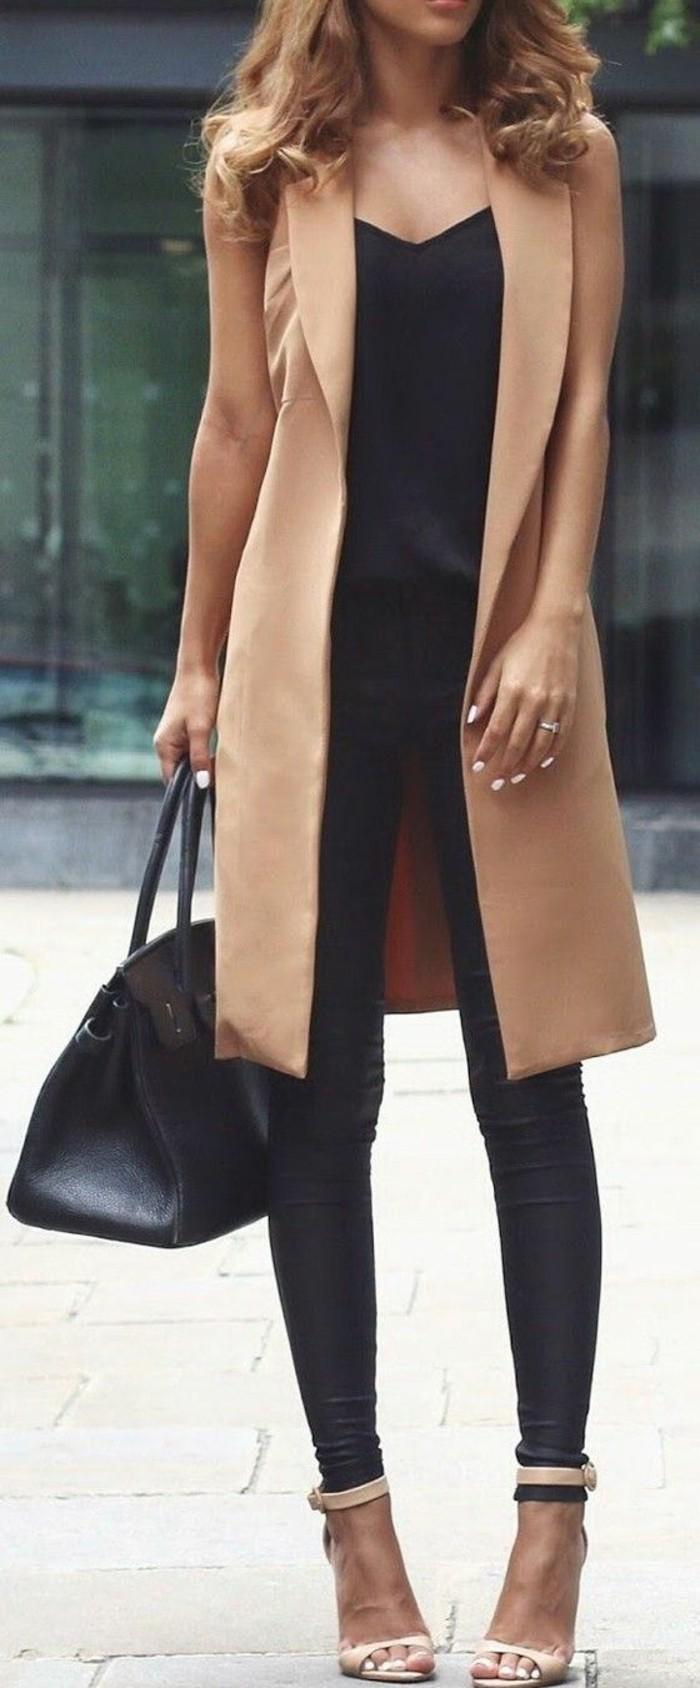 s-habiller-classe-comment-savoir-comment-s-habiller-bien-s-habiller-en-hiver-femme